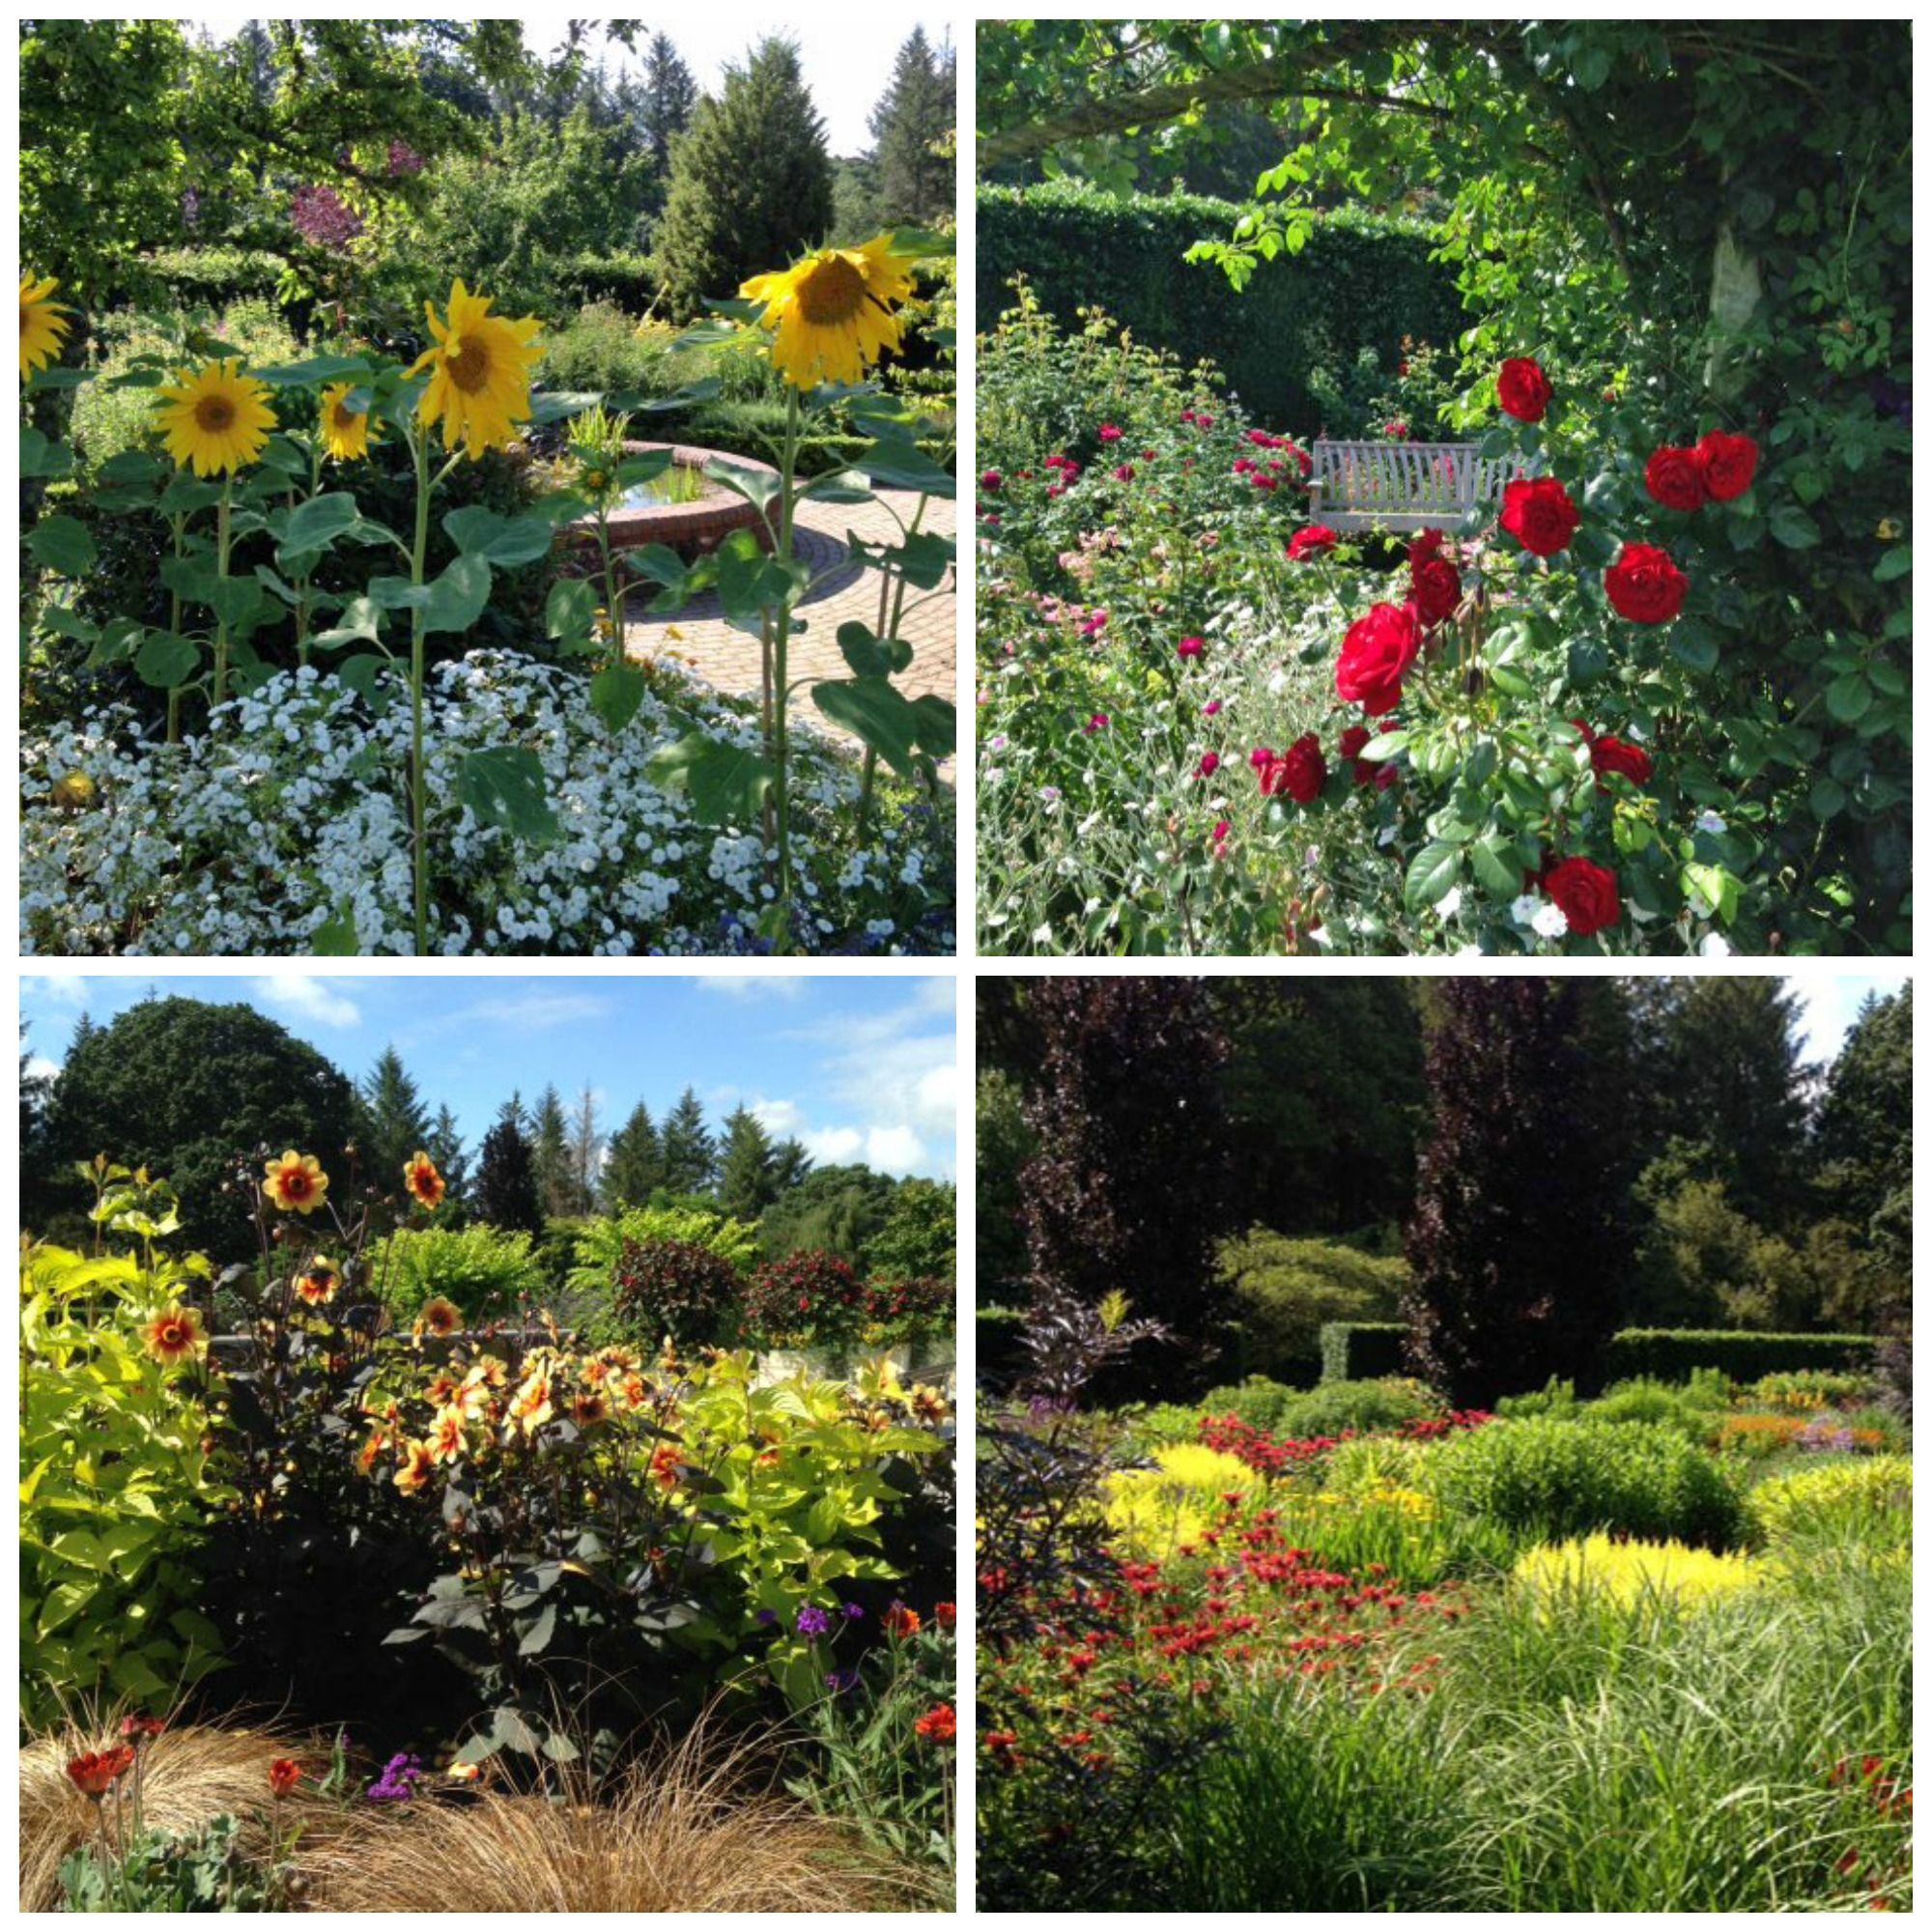 RHS Rosemoor Gardens, Rose Festival And Hot Garden